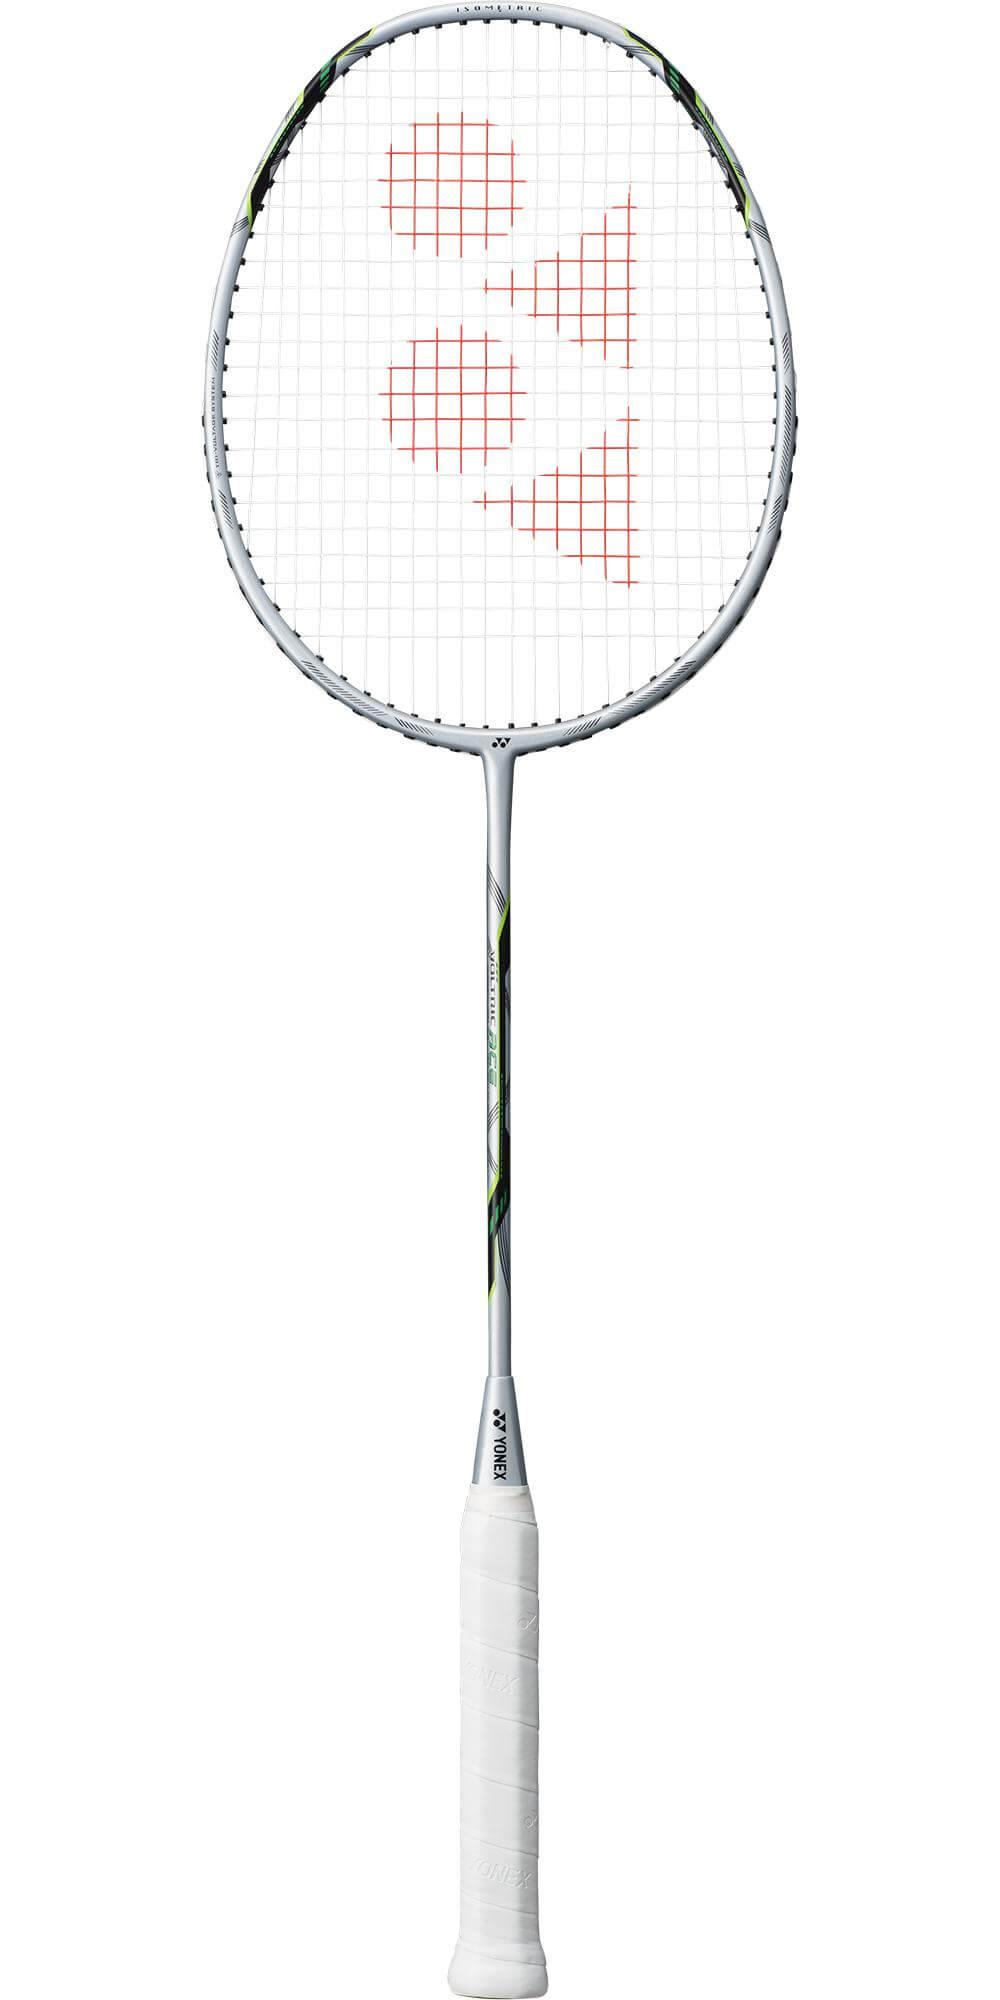 Yonex Voltric Ace Badminton Racket - ONE SIZE, SILVER